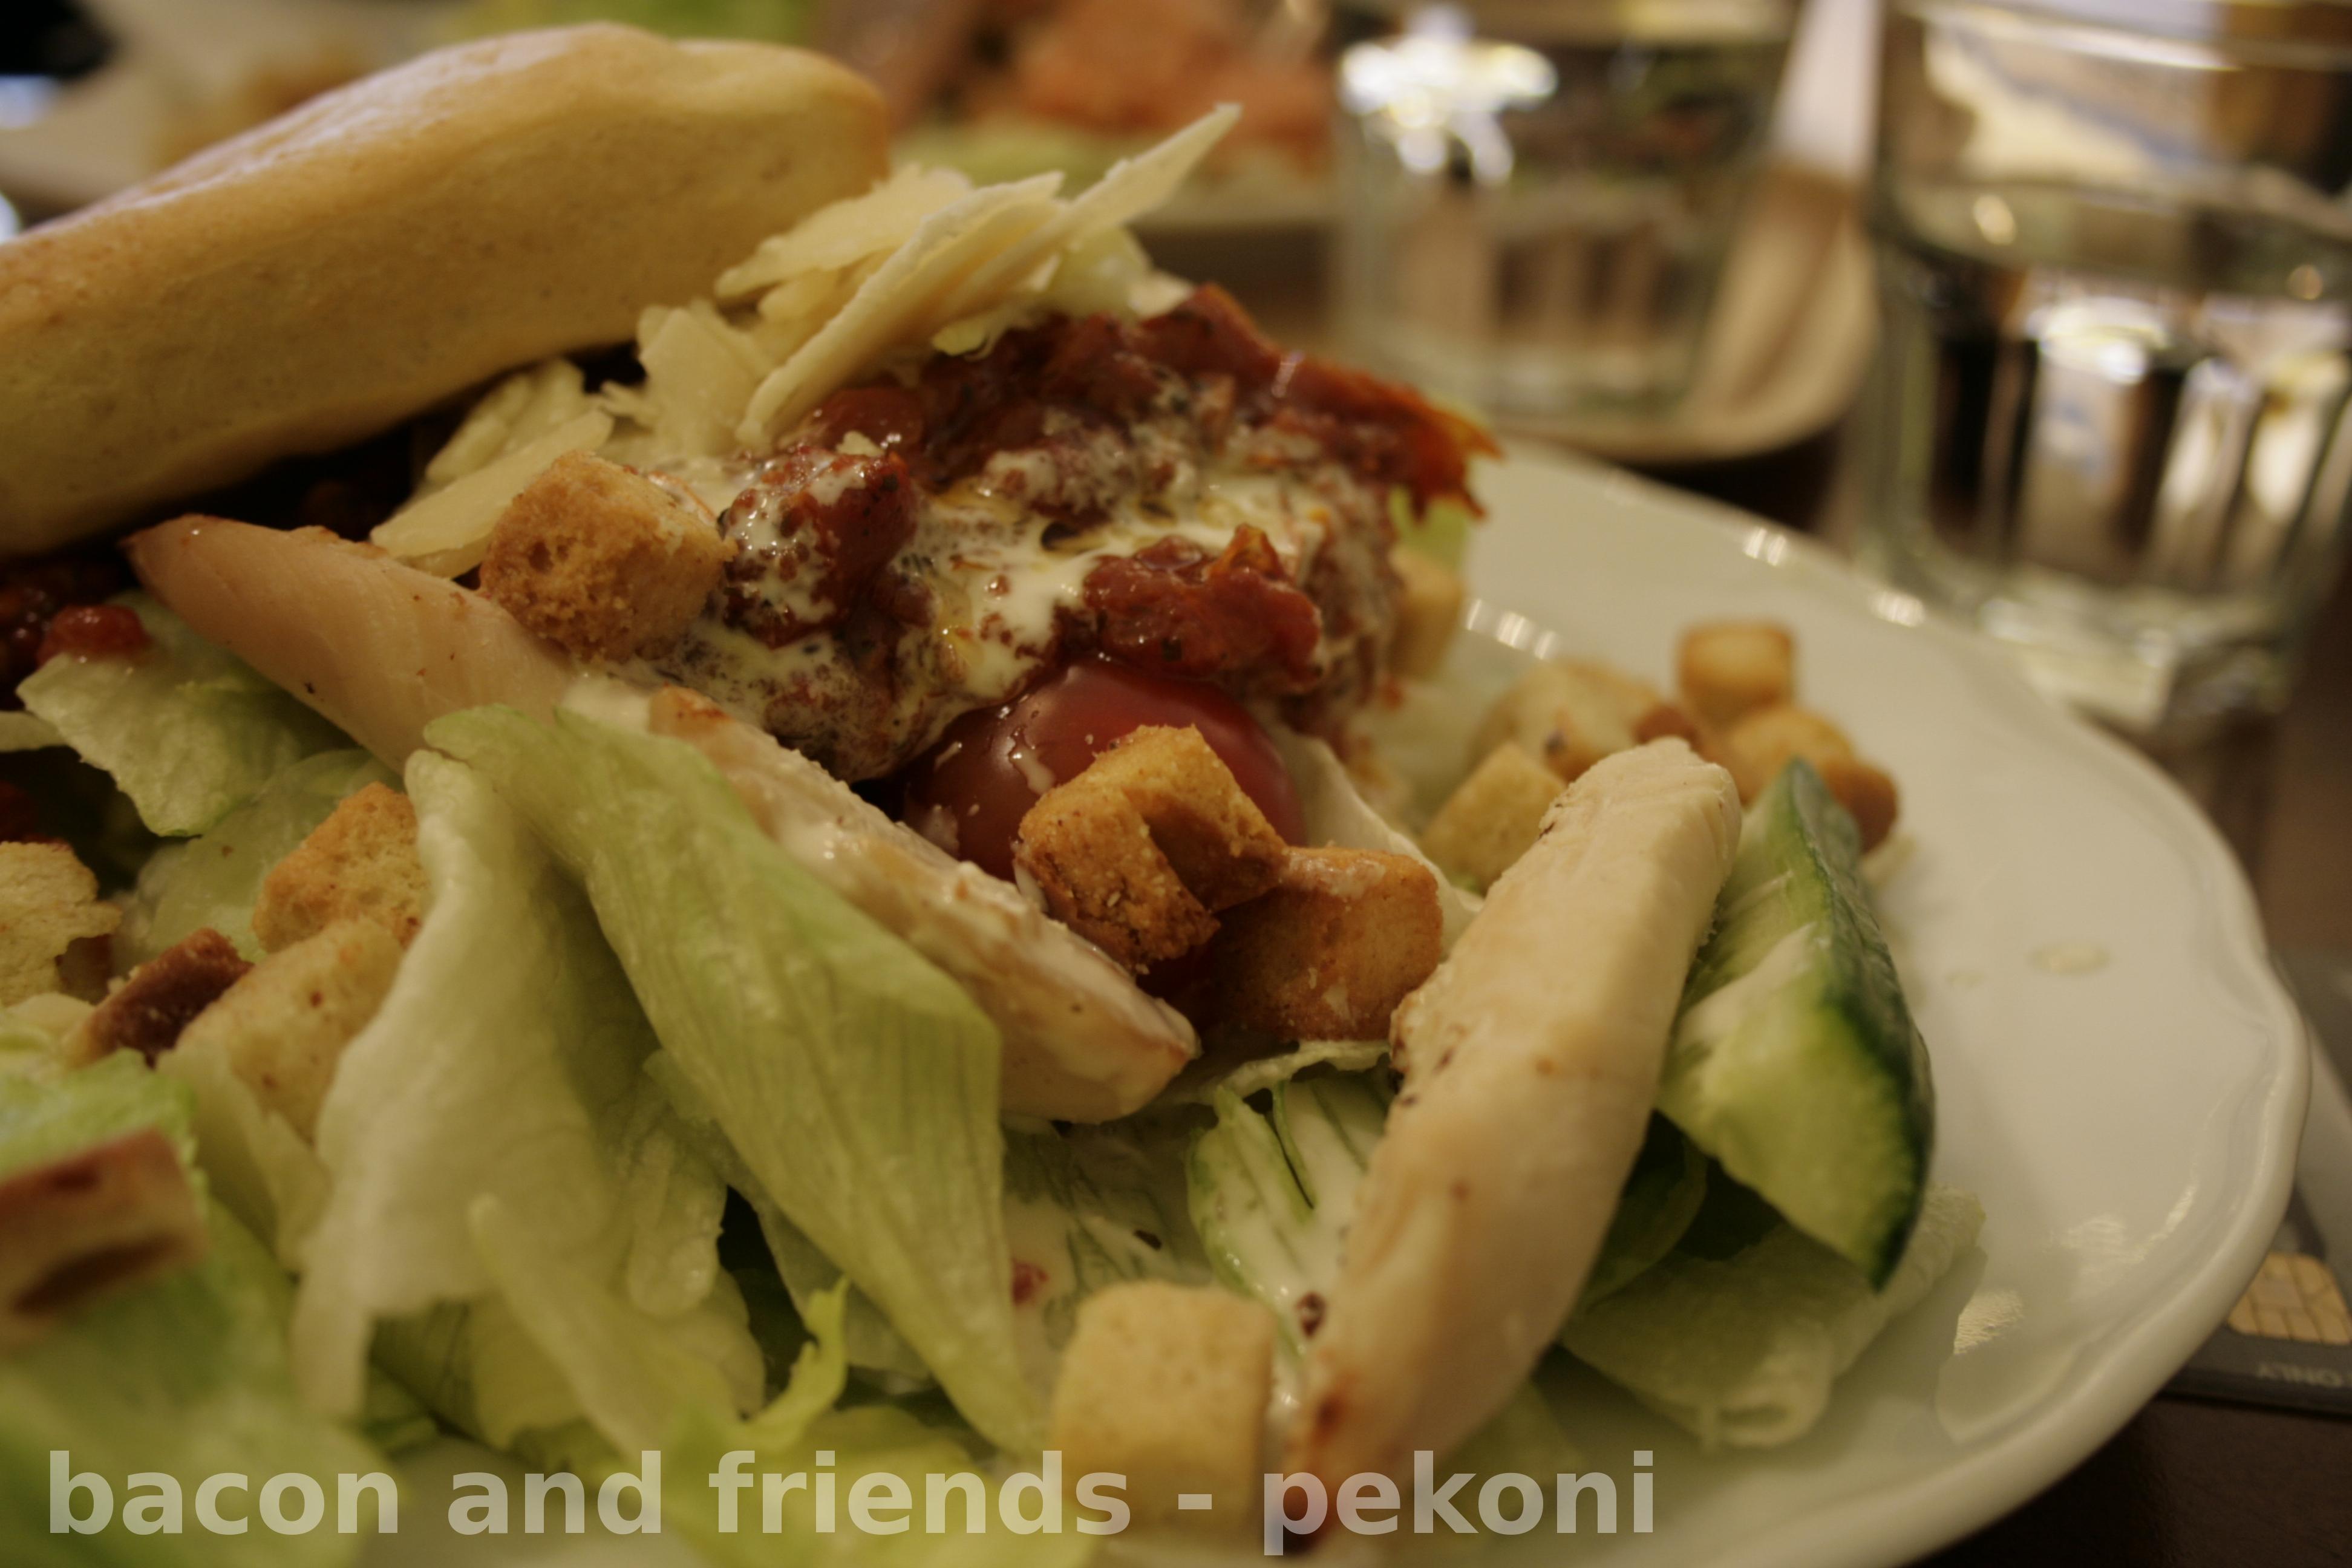 Cafe Brahe YOkatu, Turku: Chicken & tomato salad